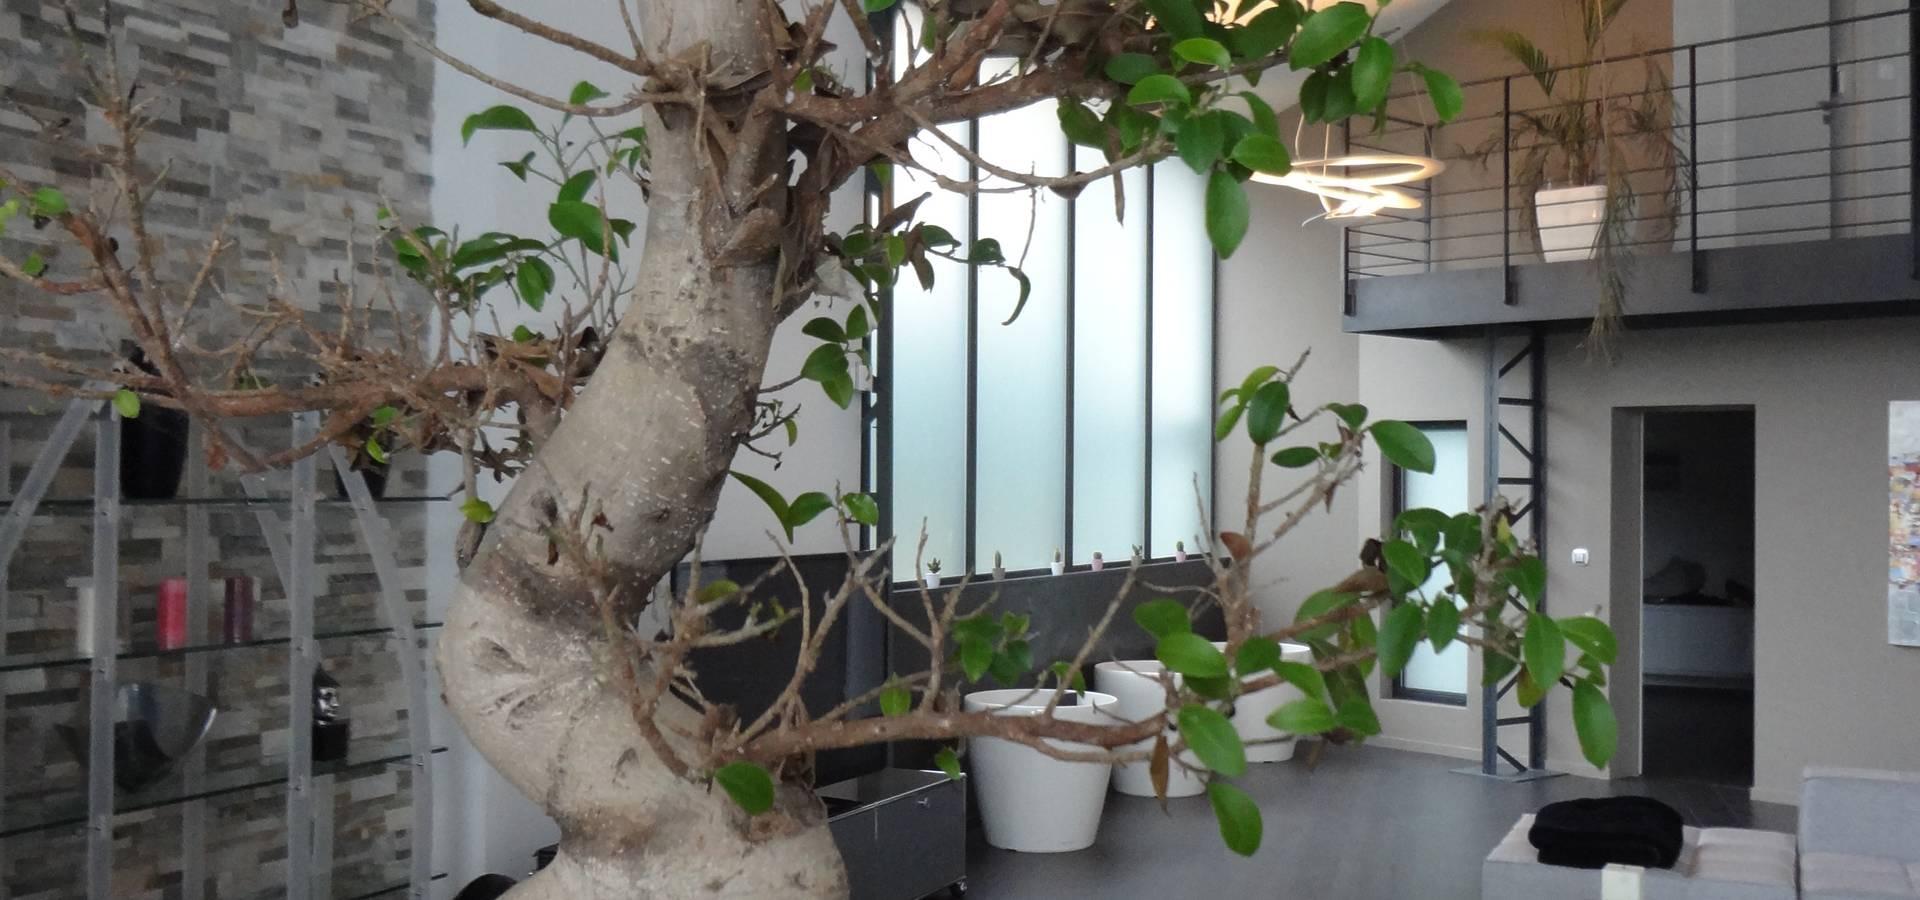 Kjbi deco interior architects in dijon homify for Ancienne maison cutlery